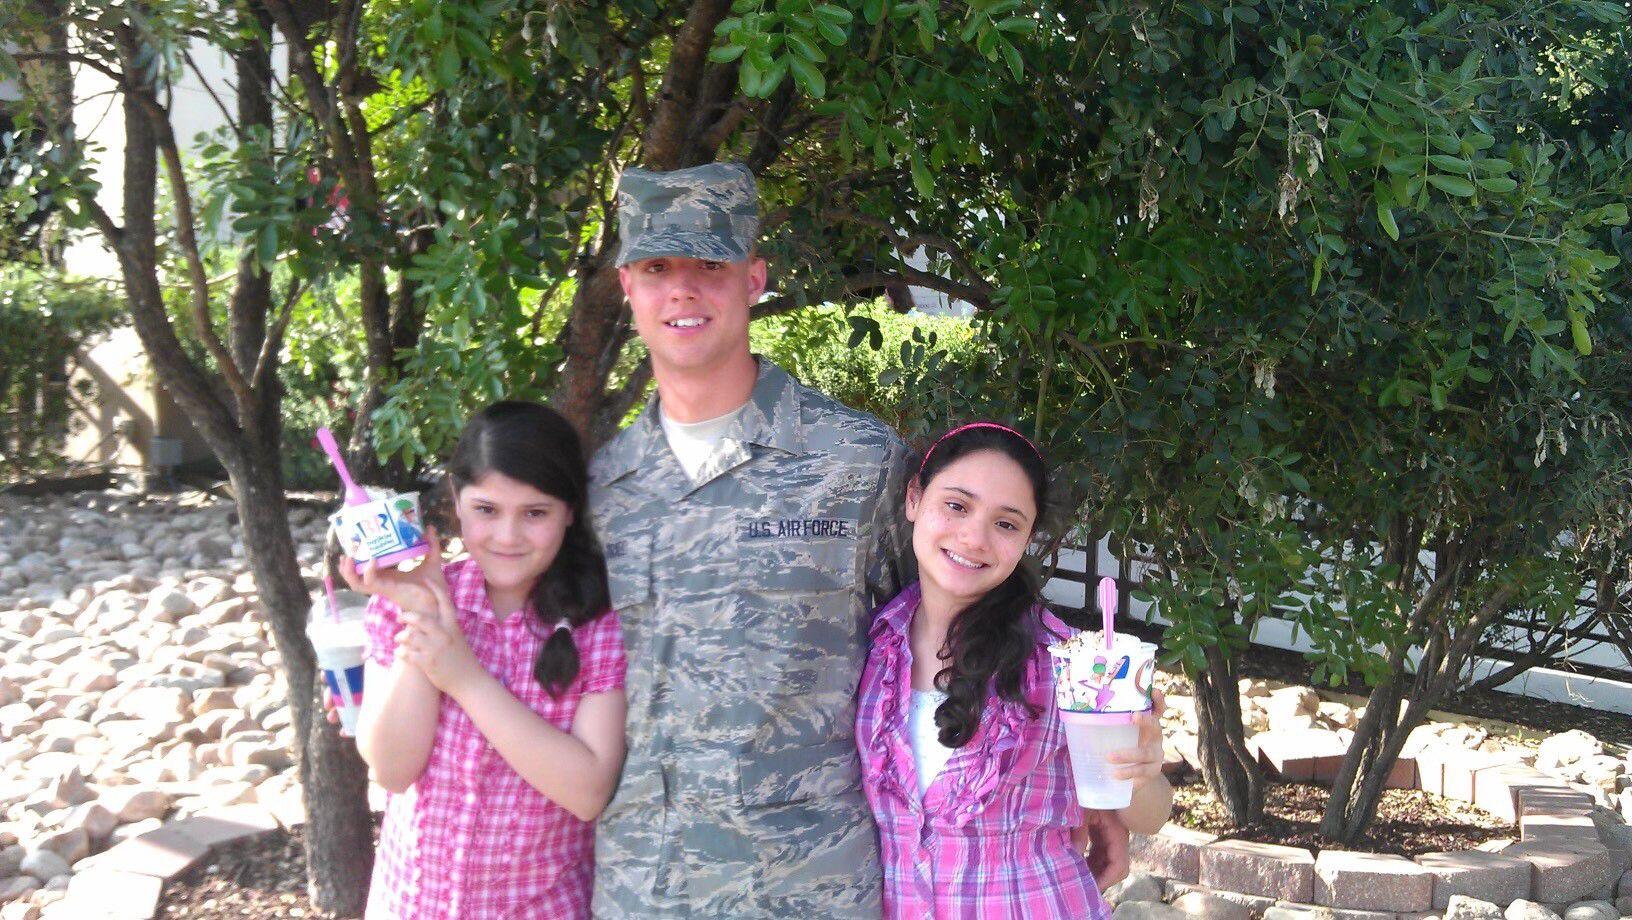 Family photo of Edgar Tirado Jr. with his sisters, Sophia Tirado and Stefania Tirado, on a family visit to his military base.